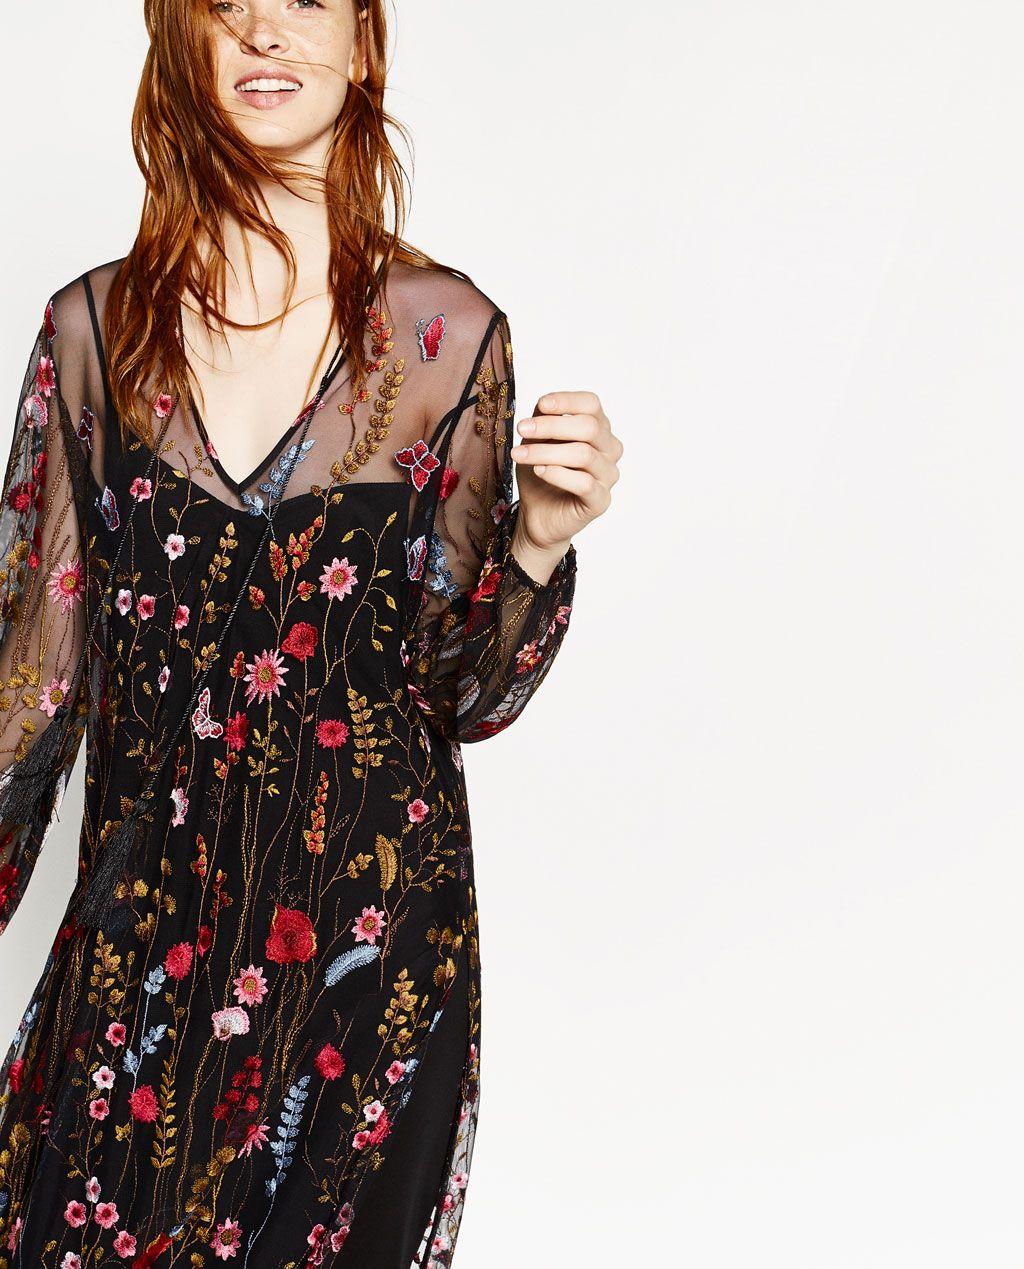 Zara Mujer Vestido Largo Bordado Vintage Long Dress Dresses Fashion Wishlist